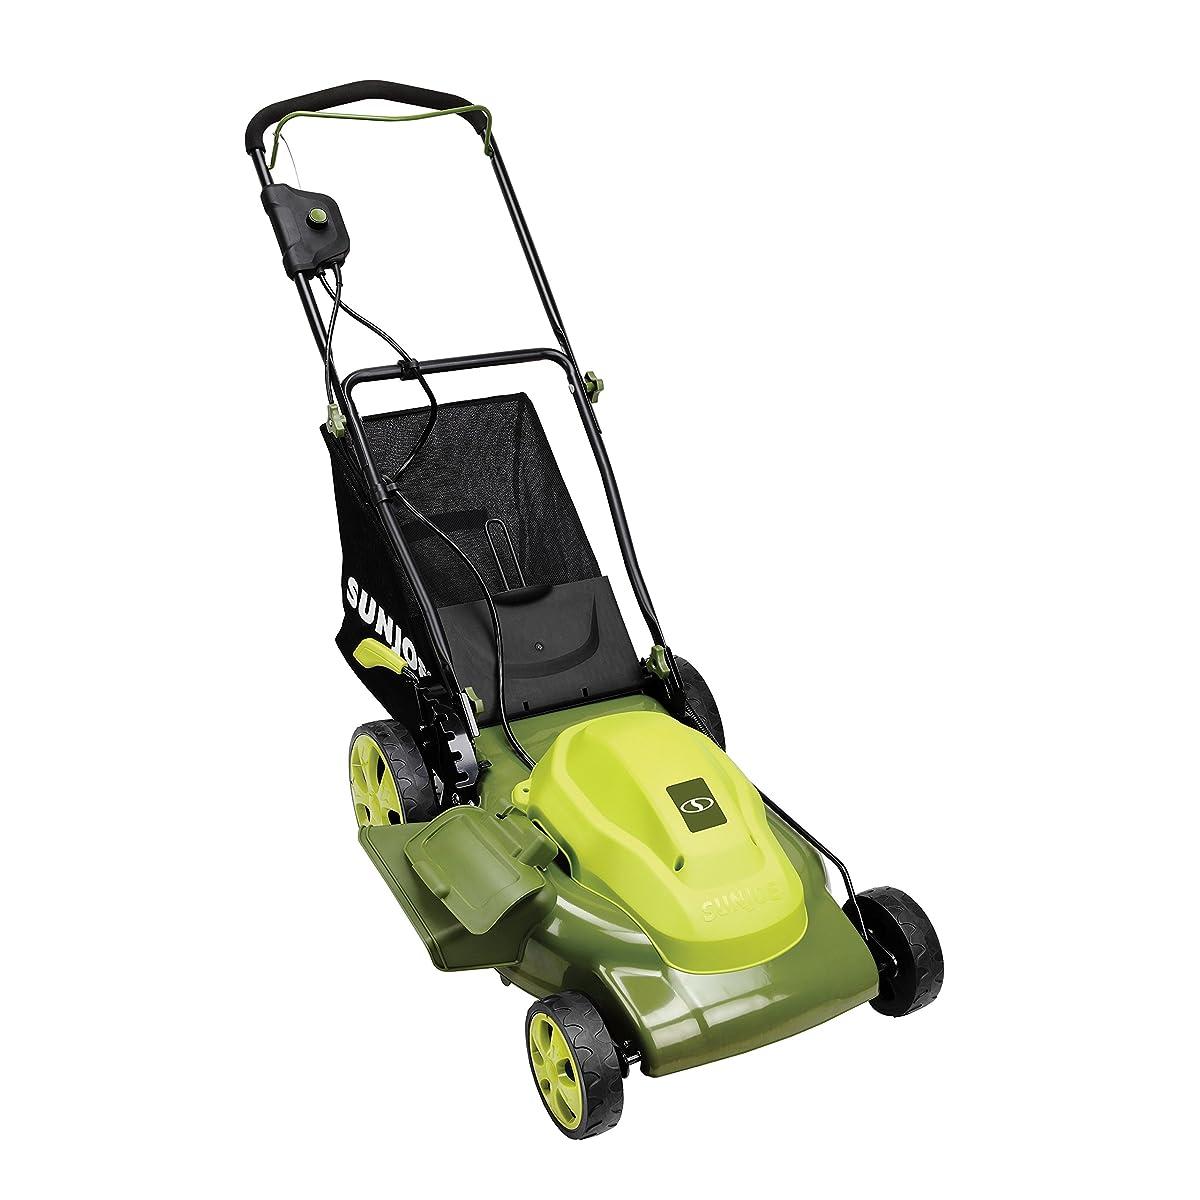 Sun Joe MJ408E Mow Joe 20-Inch 12-Amp 3-in-1 Bag/Mulch/Side Discharge Corded Electric Lawn Mower